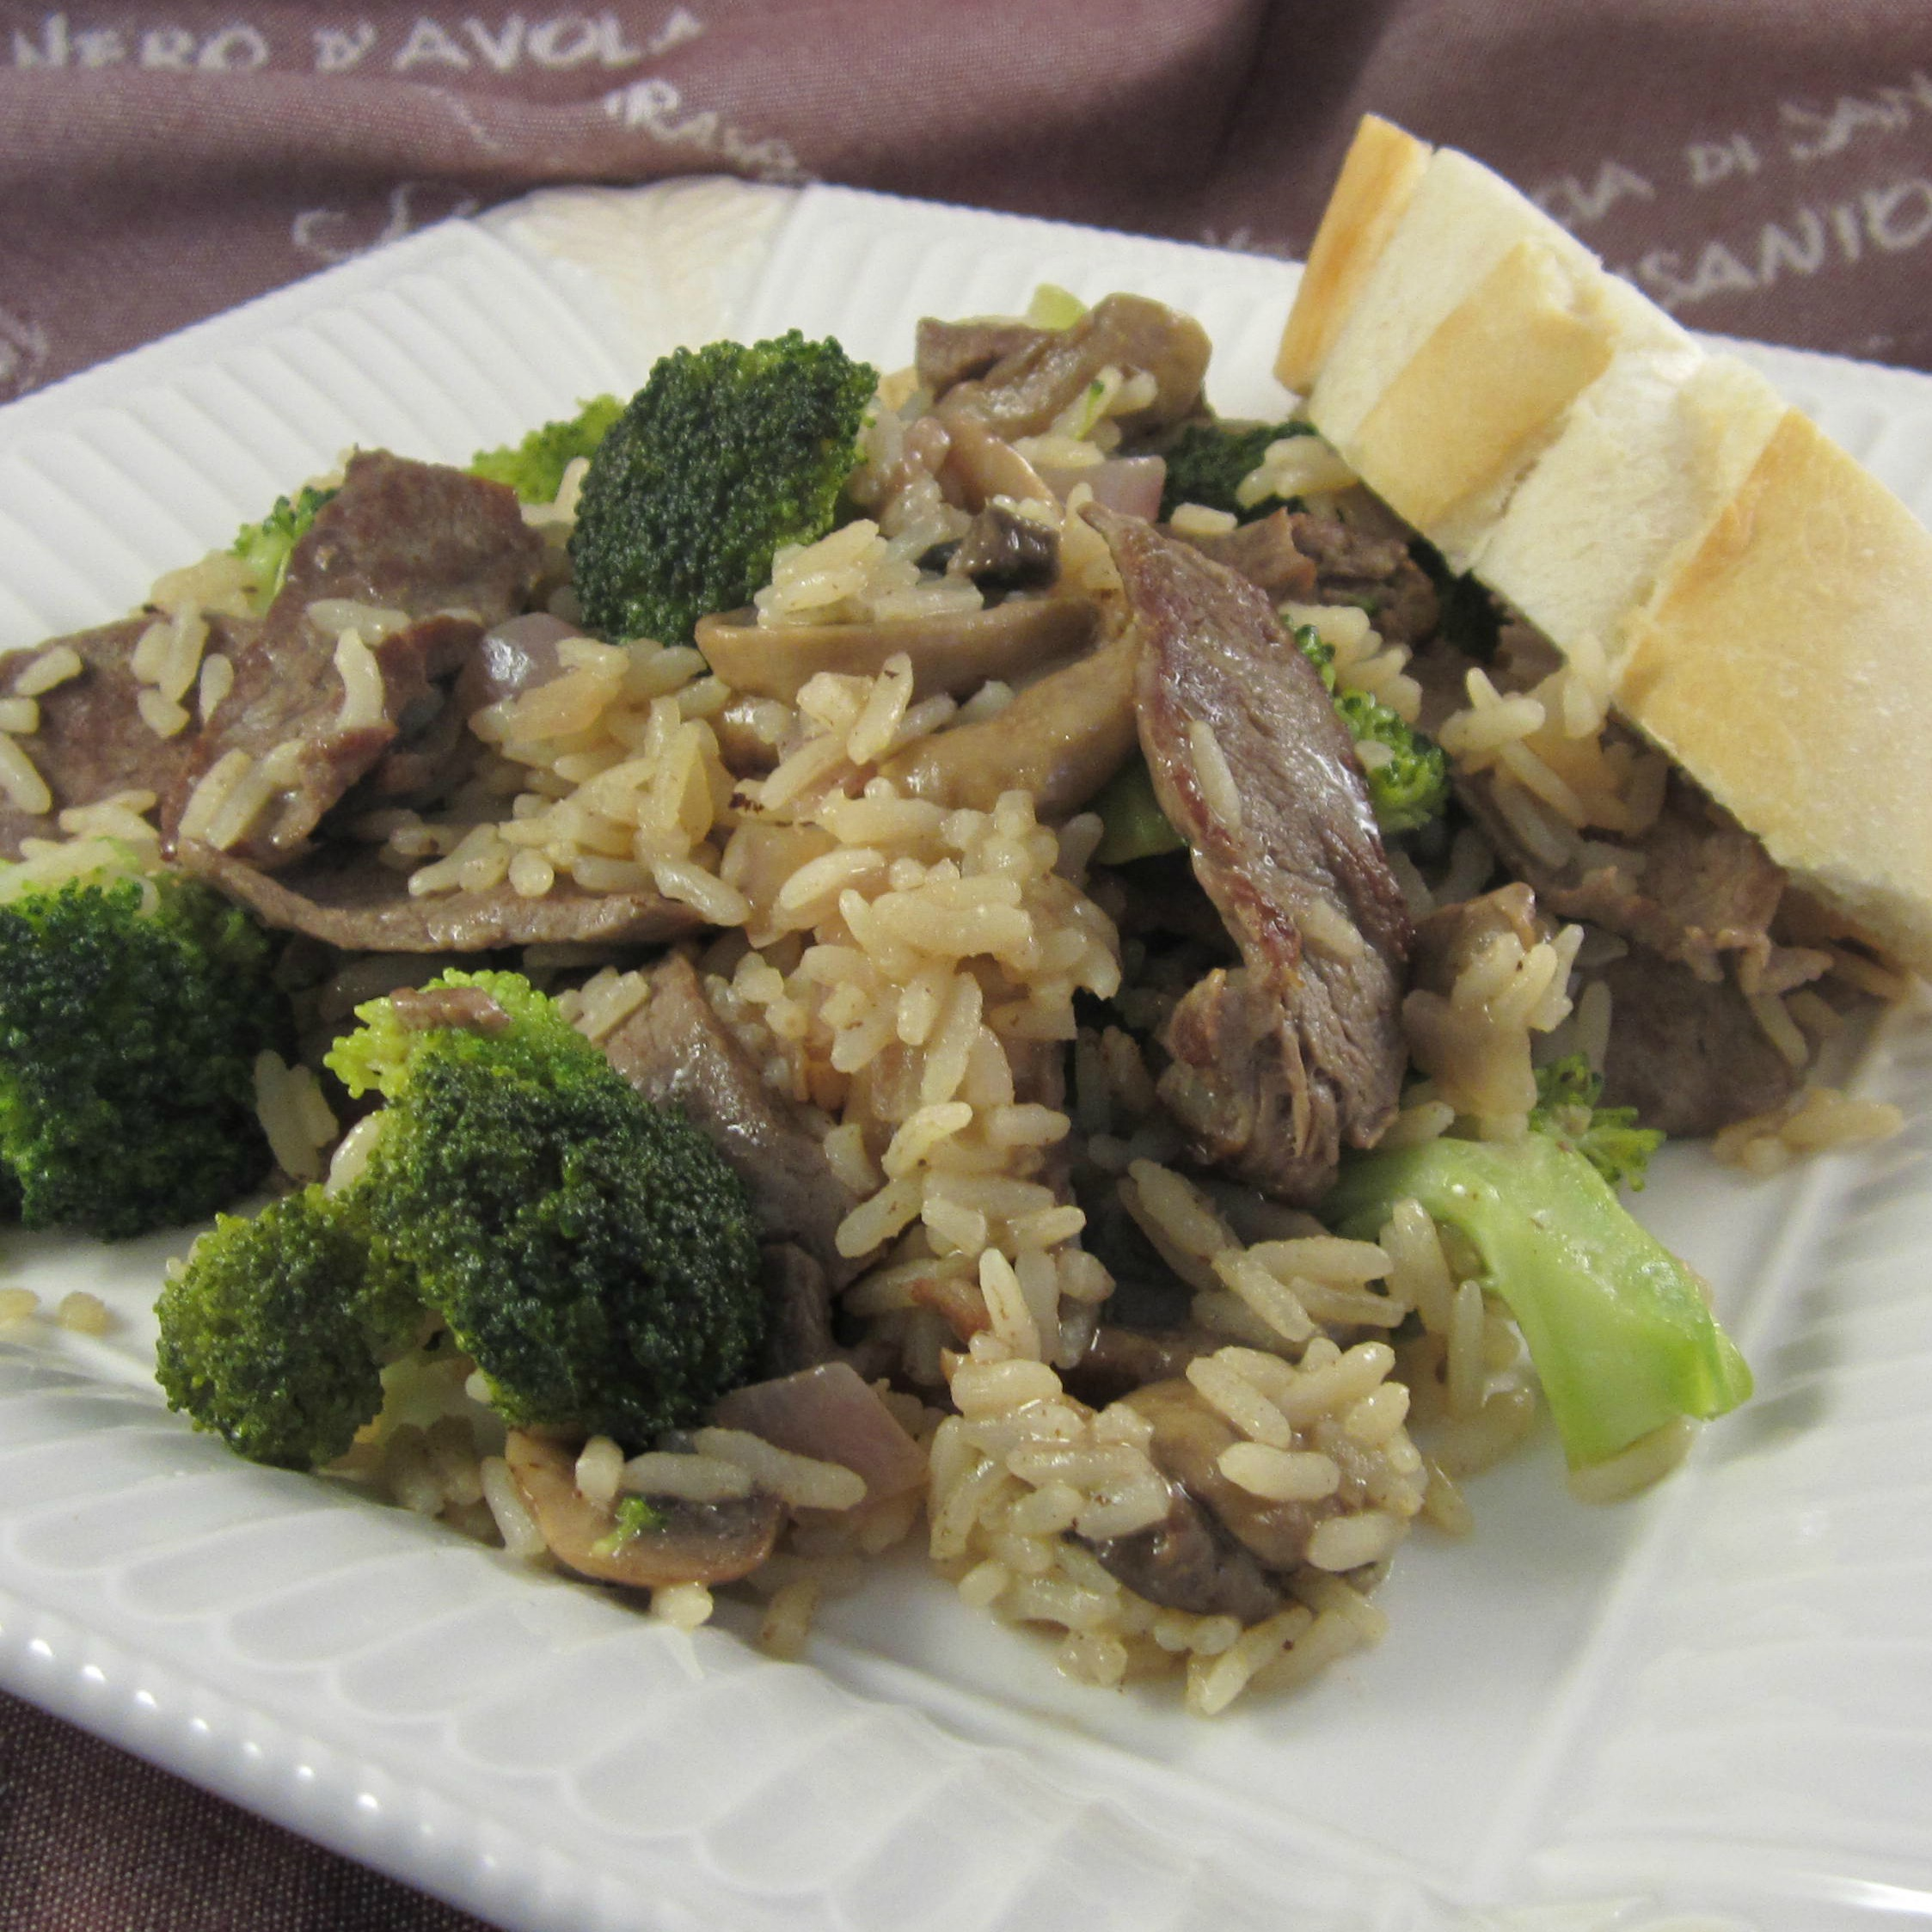 Savory Beef & Broccoli Rice Deb C